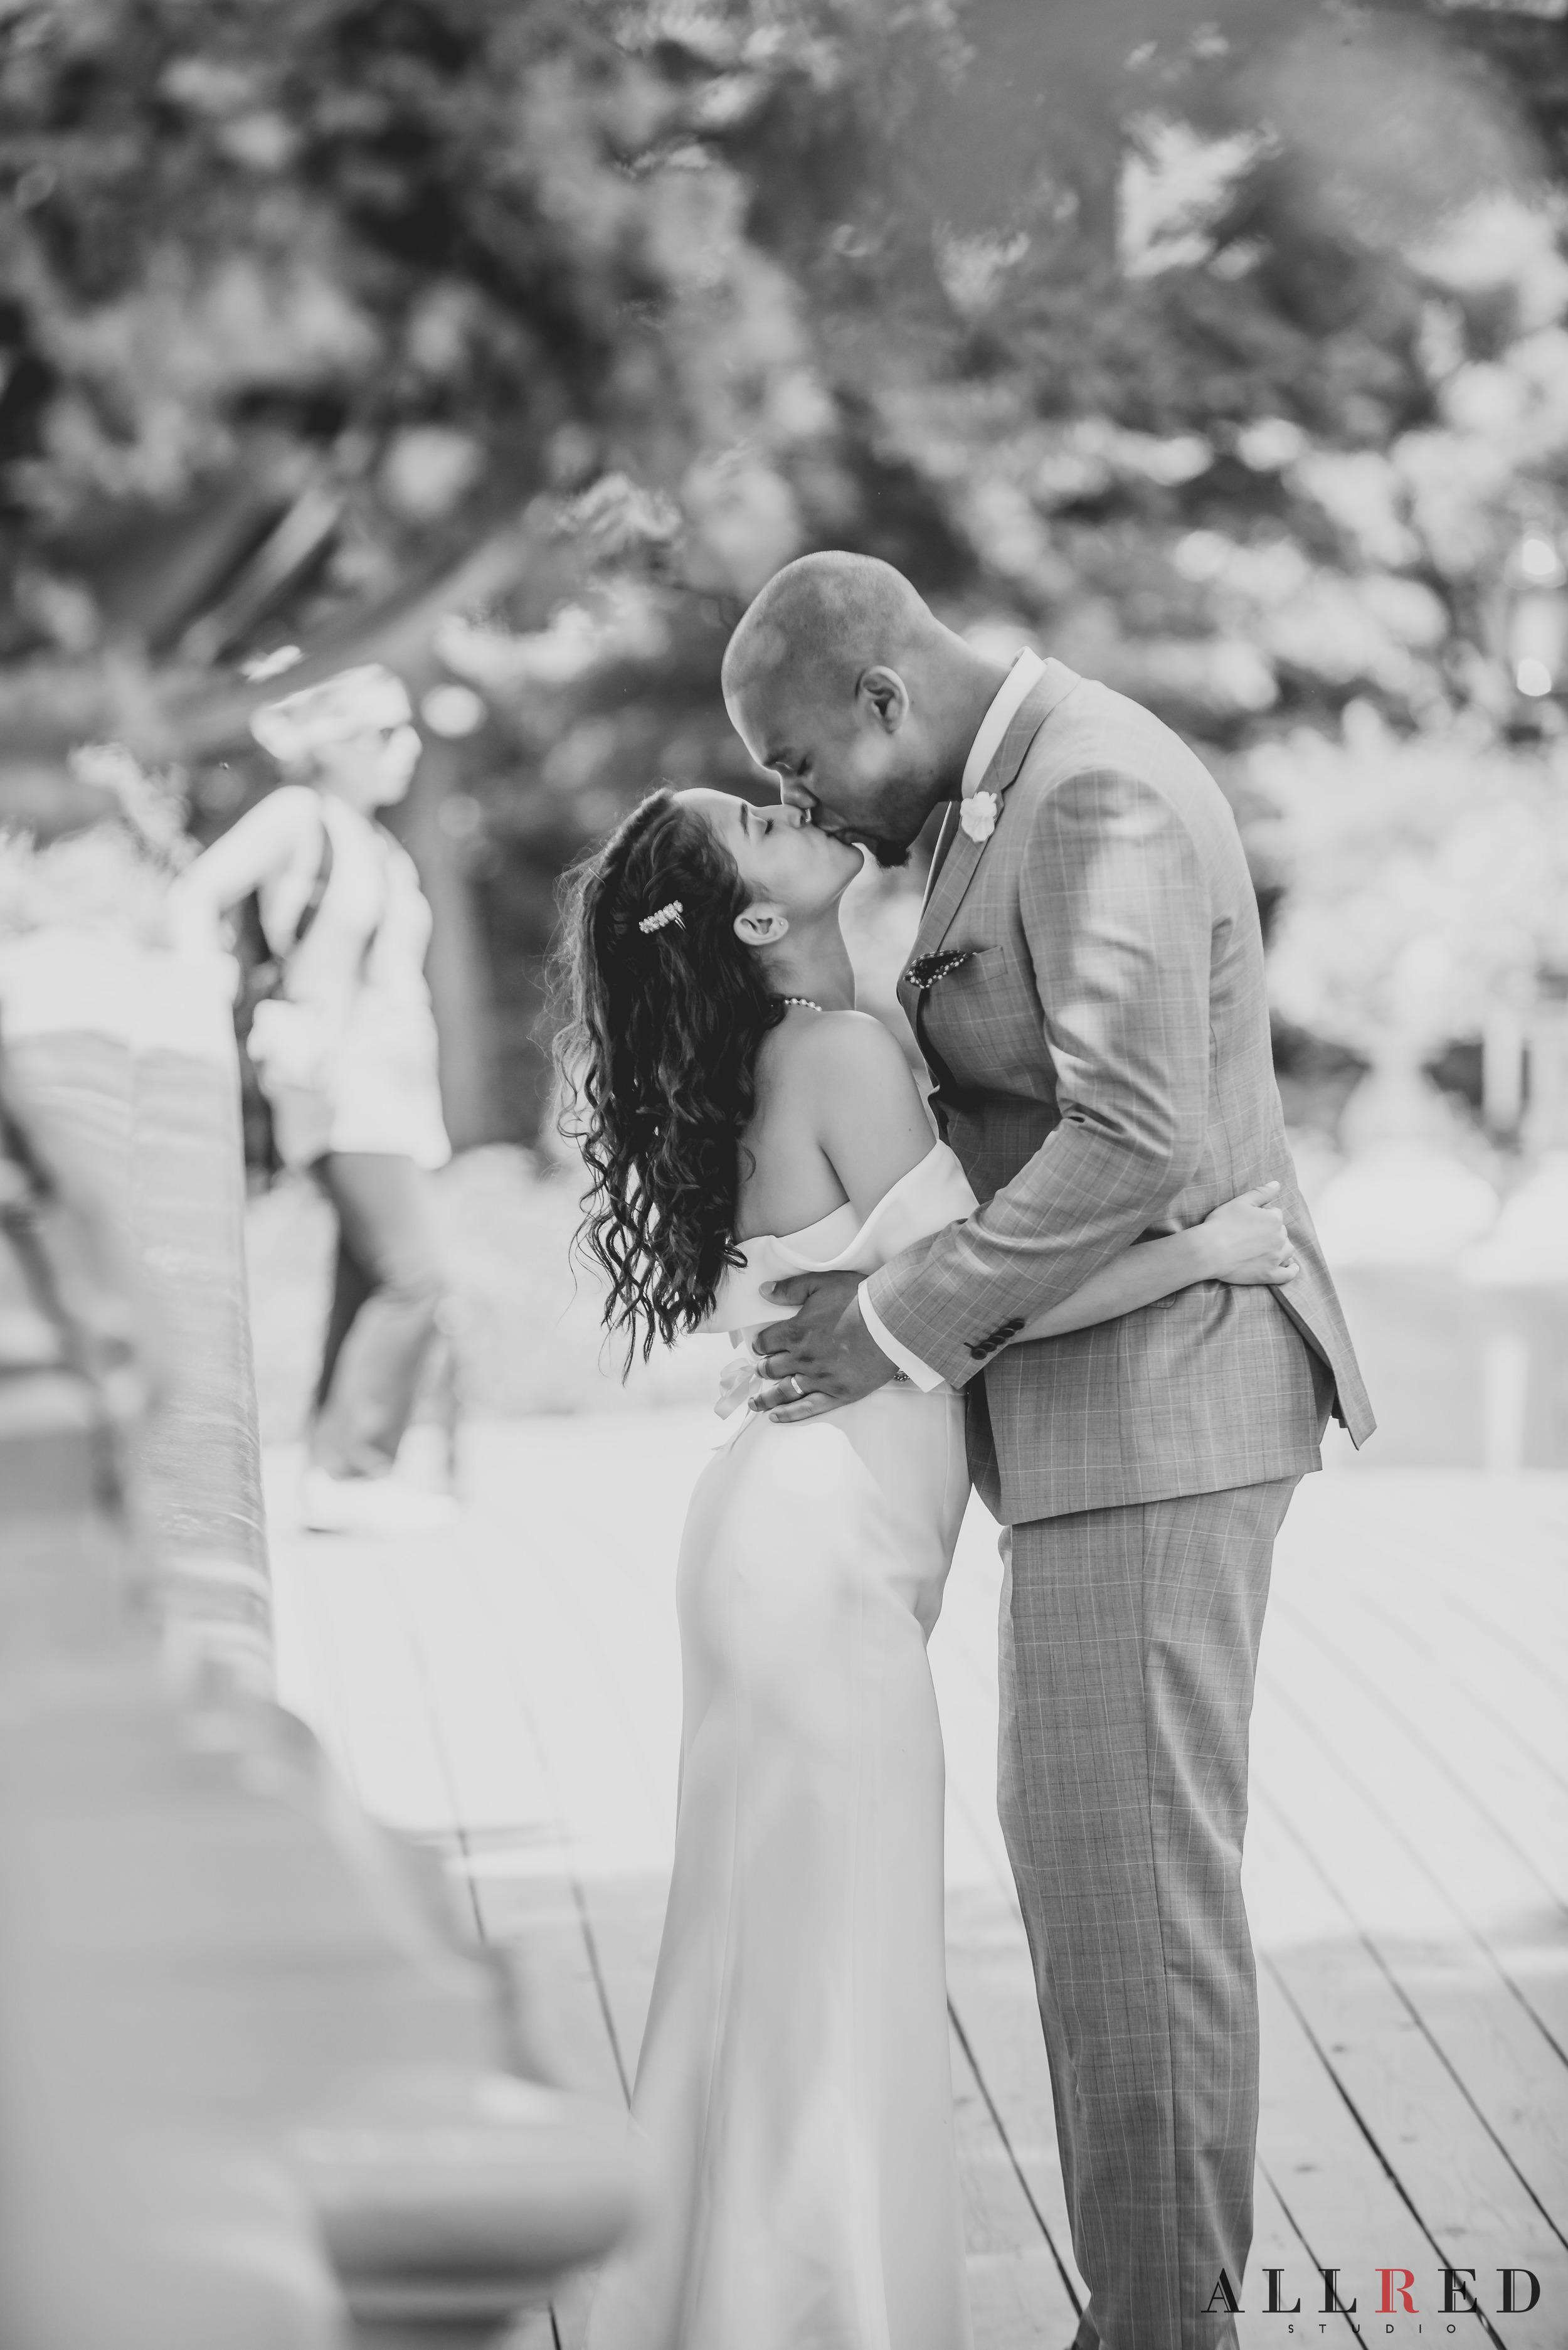 Wedding-central-park-allred-studio-new-york-photographer-new-jersey-hudson-valley-2455.jpg